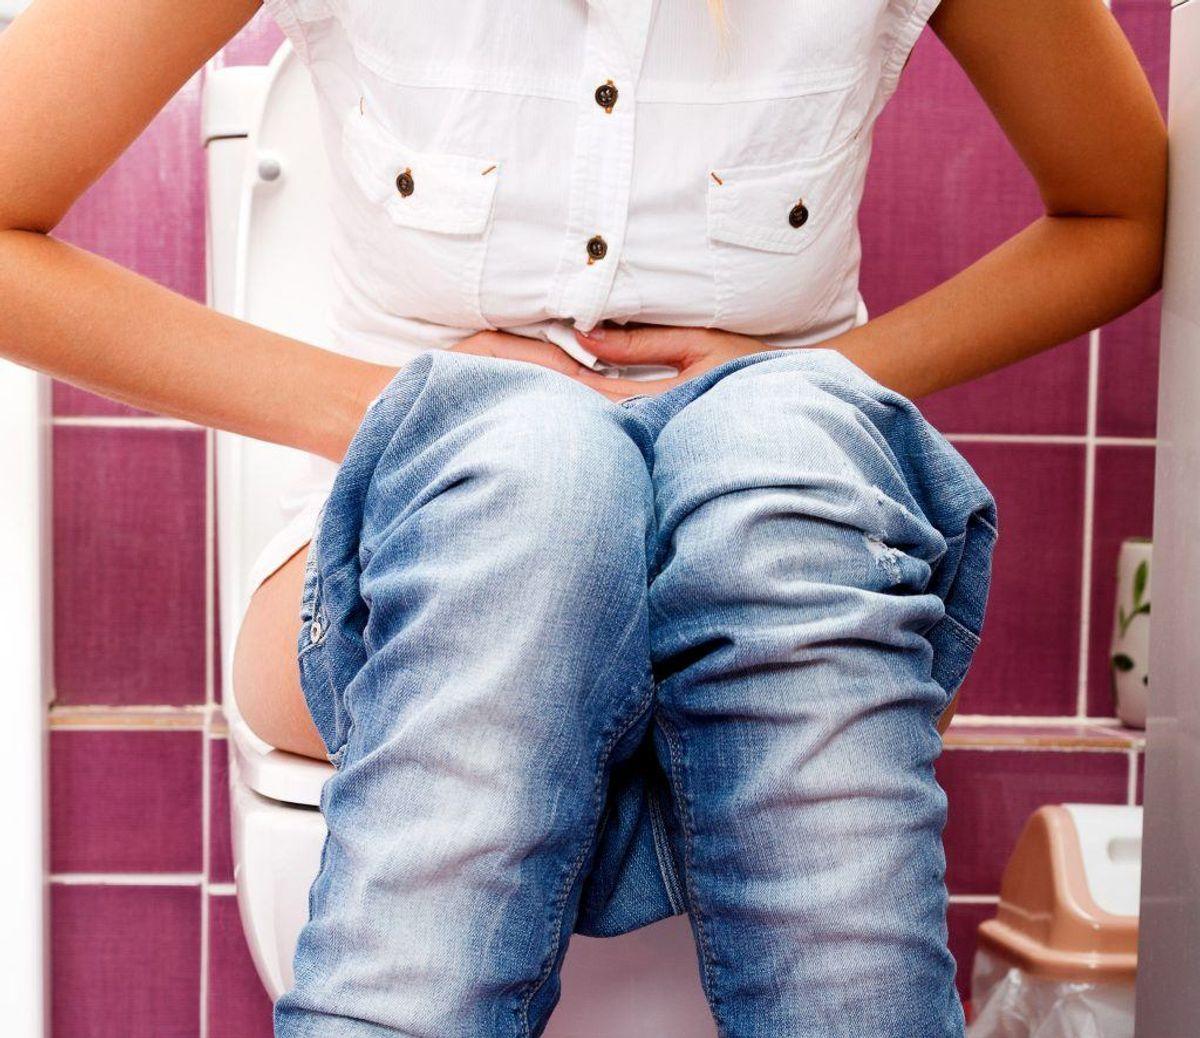 Trykken eller lette smerter bag skambenet kan også være et symptom på blærekræft. Foto: Scanpix